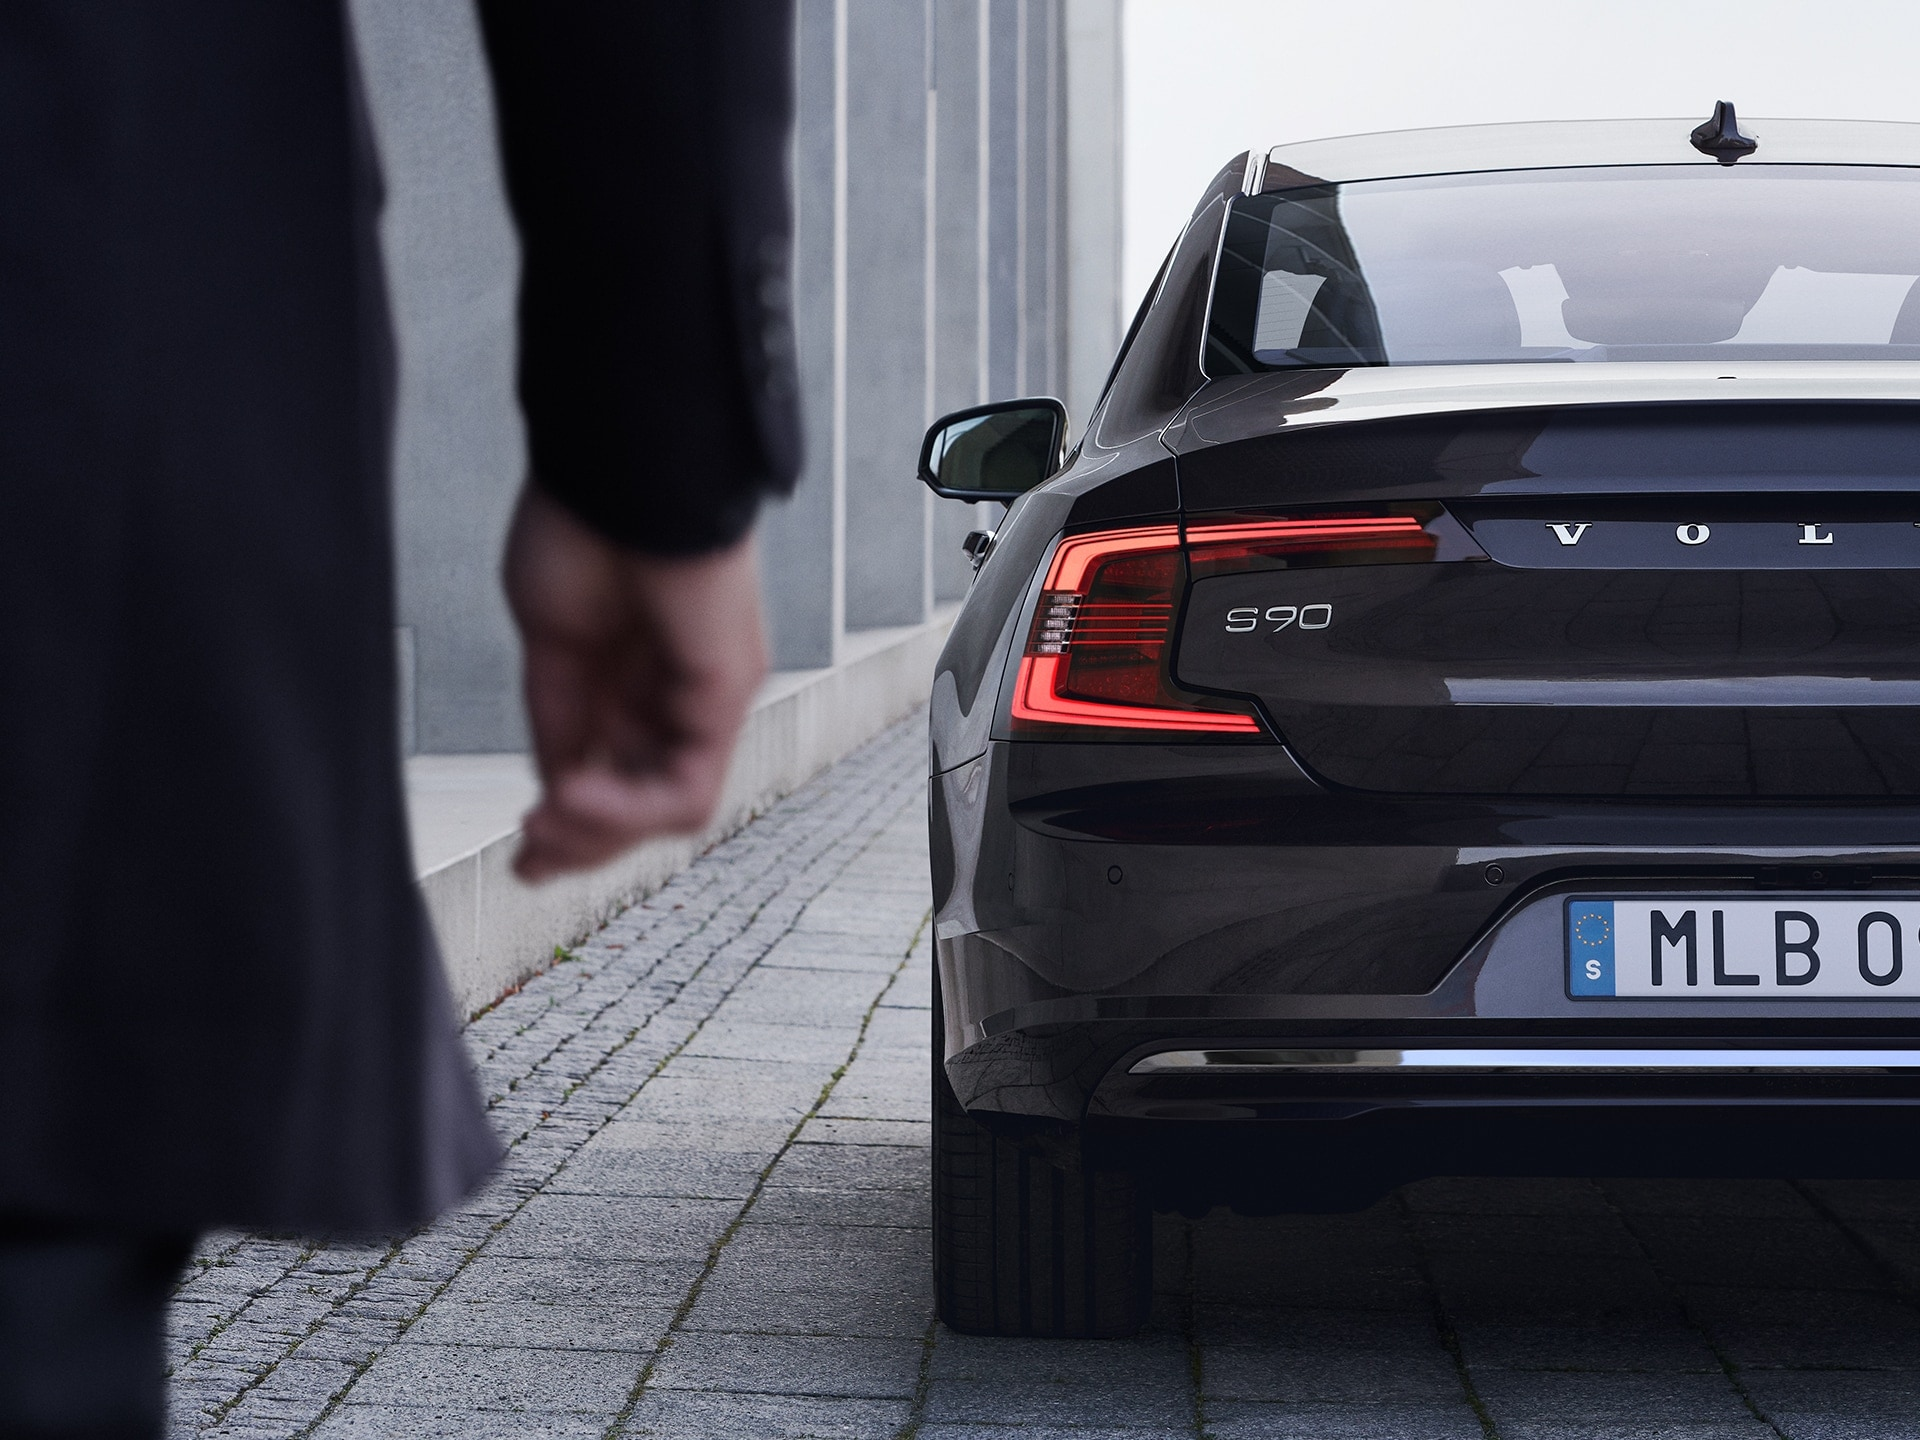 A man walks towards a black Volvo S90